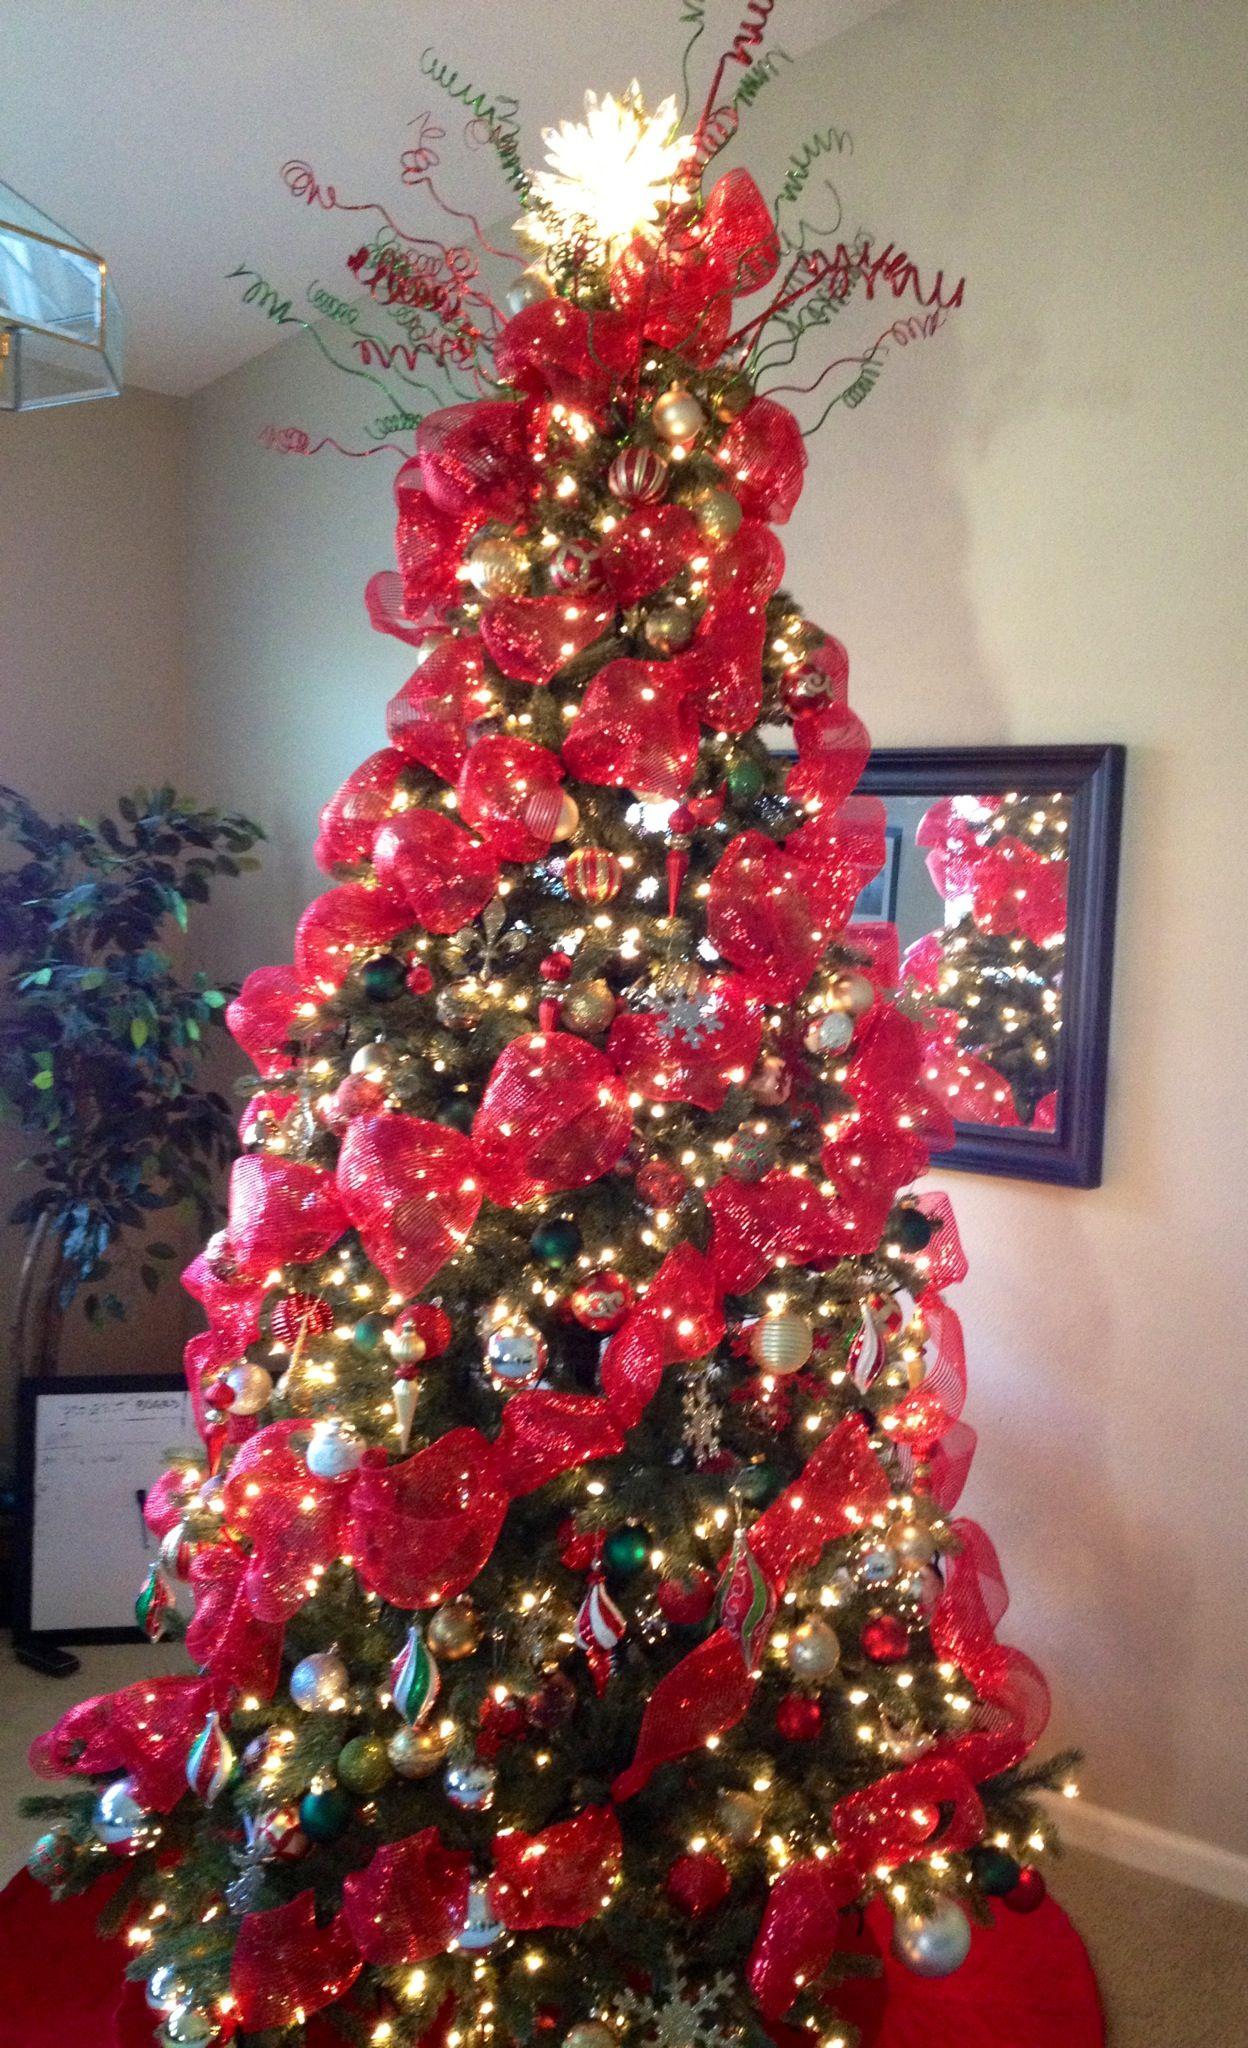 Deco Mesh Christmas Tree I Made Mesh Christmas Tree Ribbon On Christmas Tree Christmas Tree Mesh Ribbon